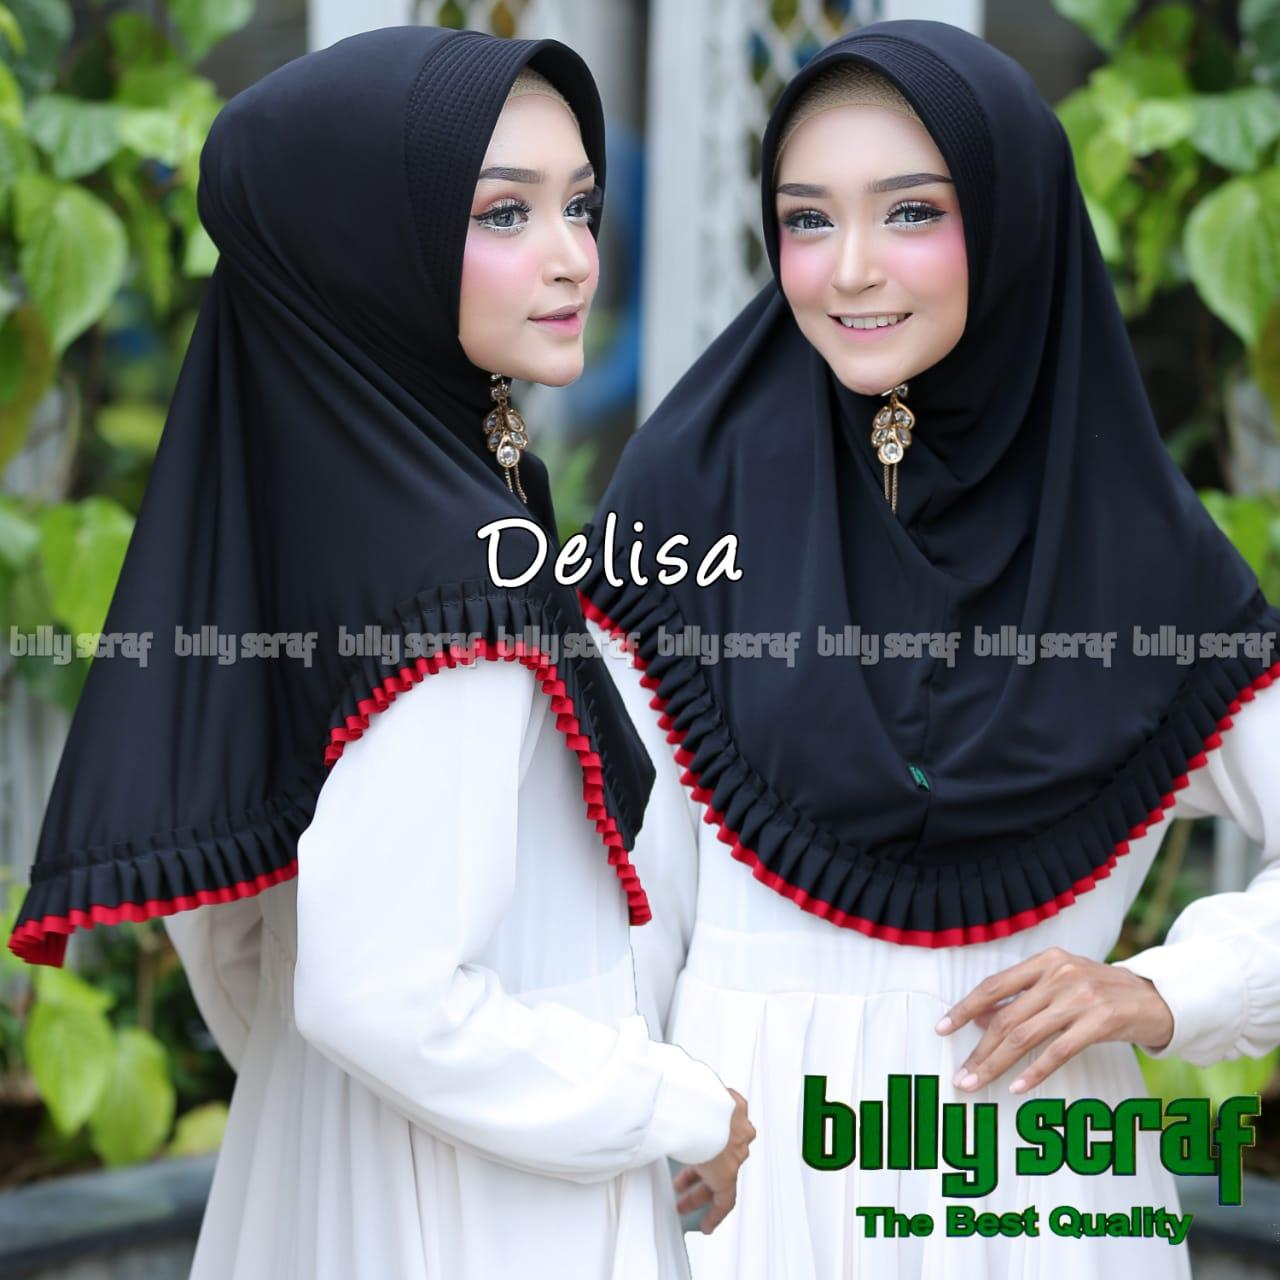 badgeHijab/Jilbab Instan Model Bergo terbaru termurah dan Terlaris / Kerudung Wanita Jersey DELISA / DNK Jaya